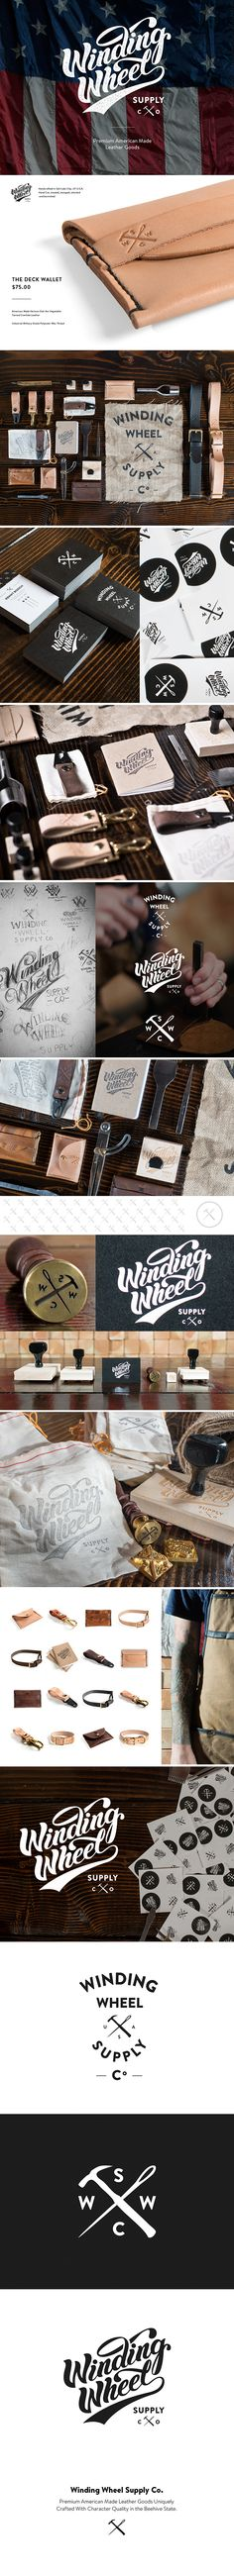 Winding Wheel Supply Co on Behance Brand Identity Design, Branding Design, Logo Design, Graphic Design, Corporate Branding, Logo Branding, Stationary Design, Brand It, Creative Logo